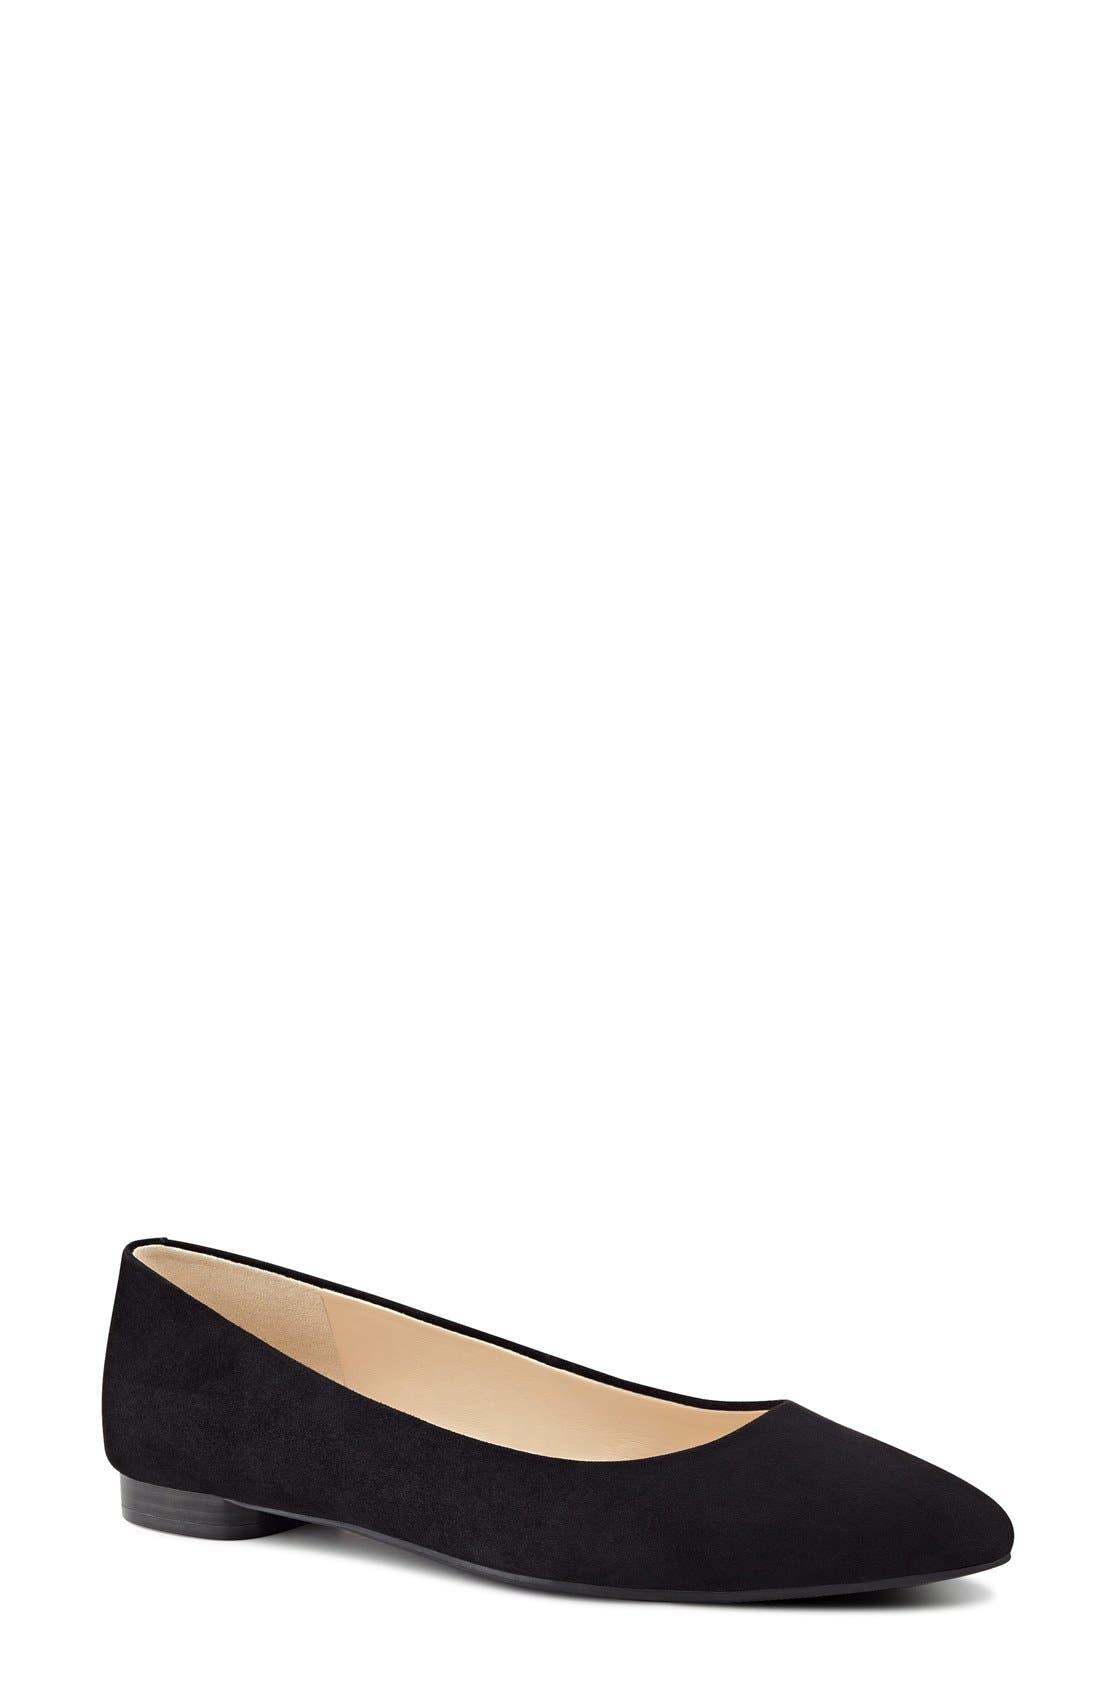 Main Image - Nine West 'Onlee' Pointy Toe Flat (Women)